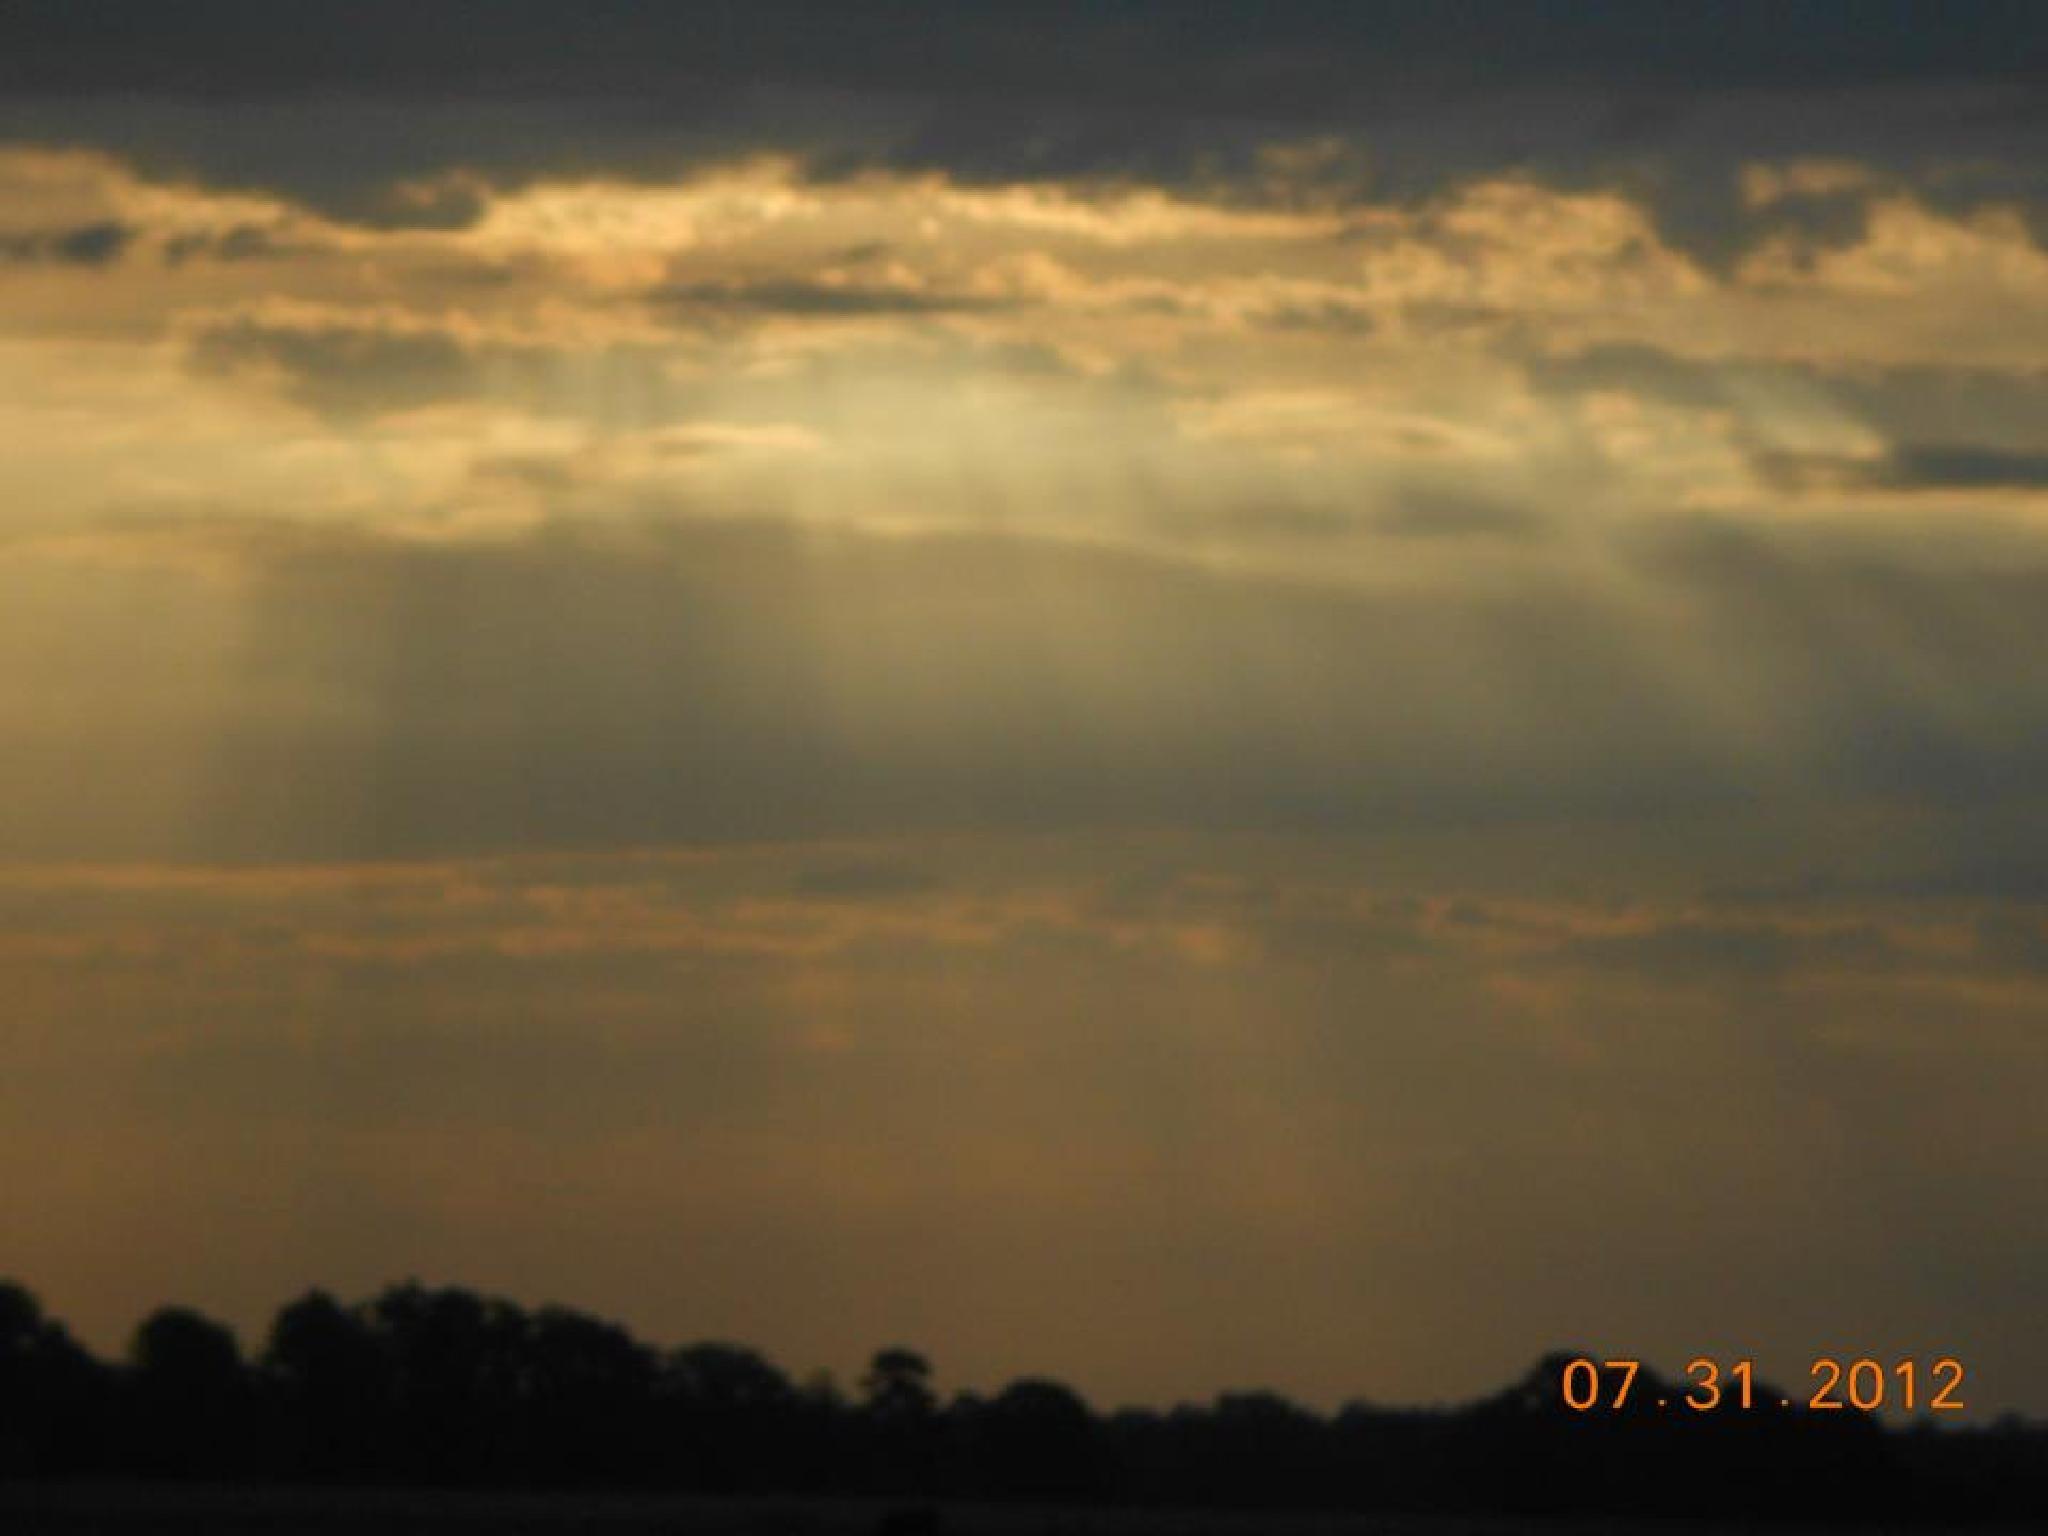 A New Dawn by Zany Dee